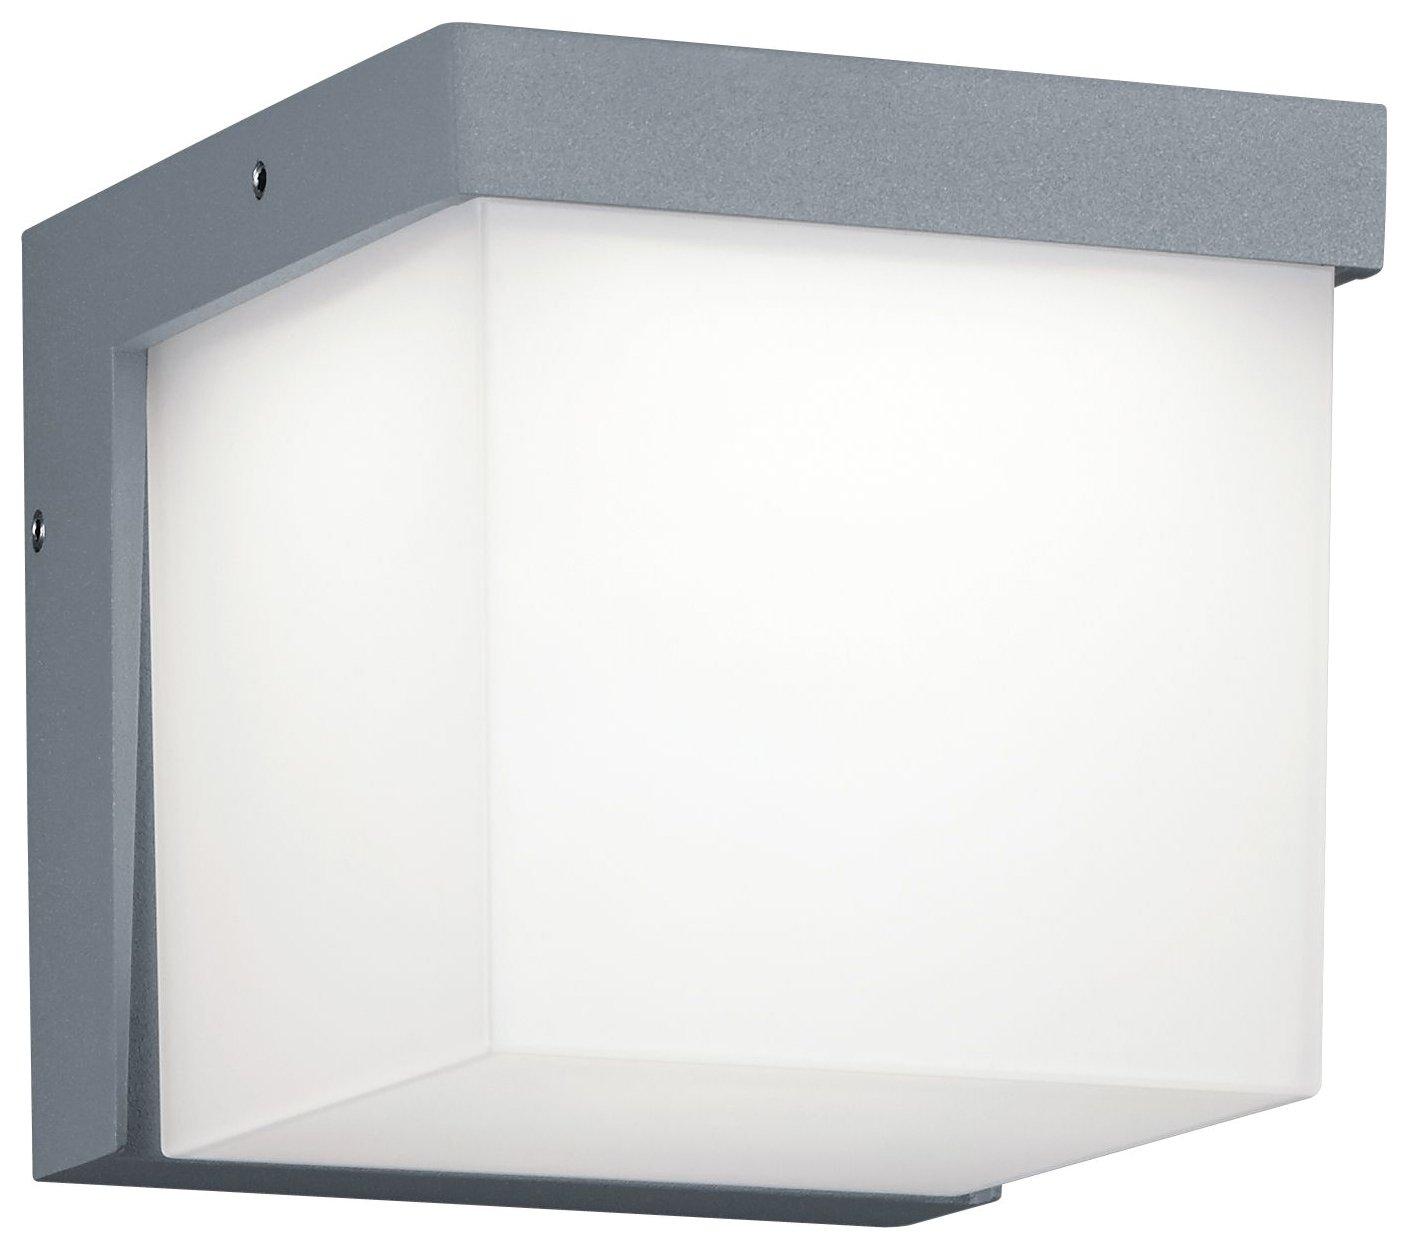 Trio Leuchten LED-Aussen-Wandleuchte Yangtze Aluminiumguss, anthrazit, Acryl weiß 228260142 [Energieklasse A++] Acryl weiß 228260142